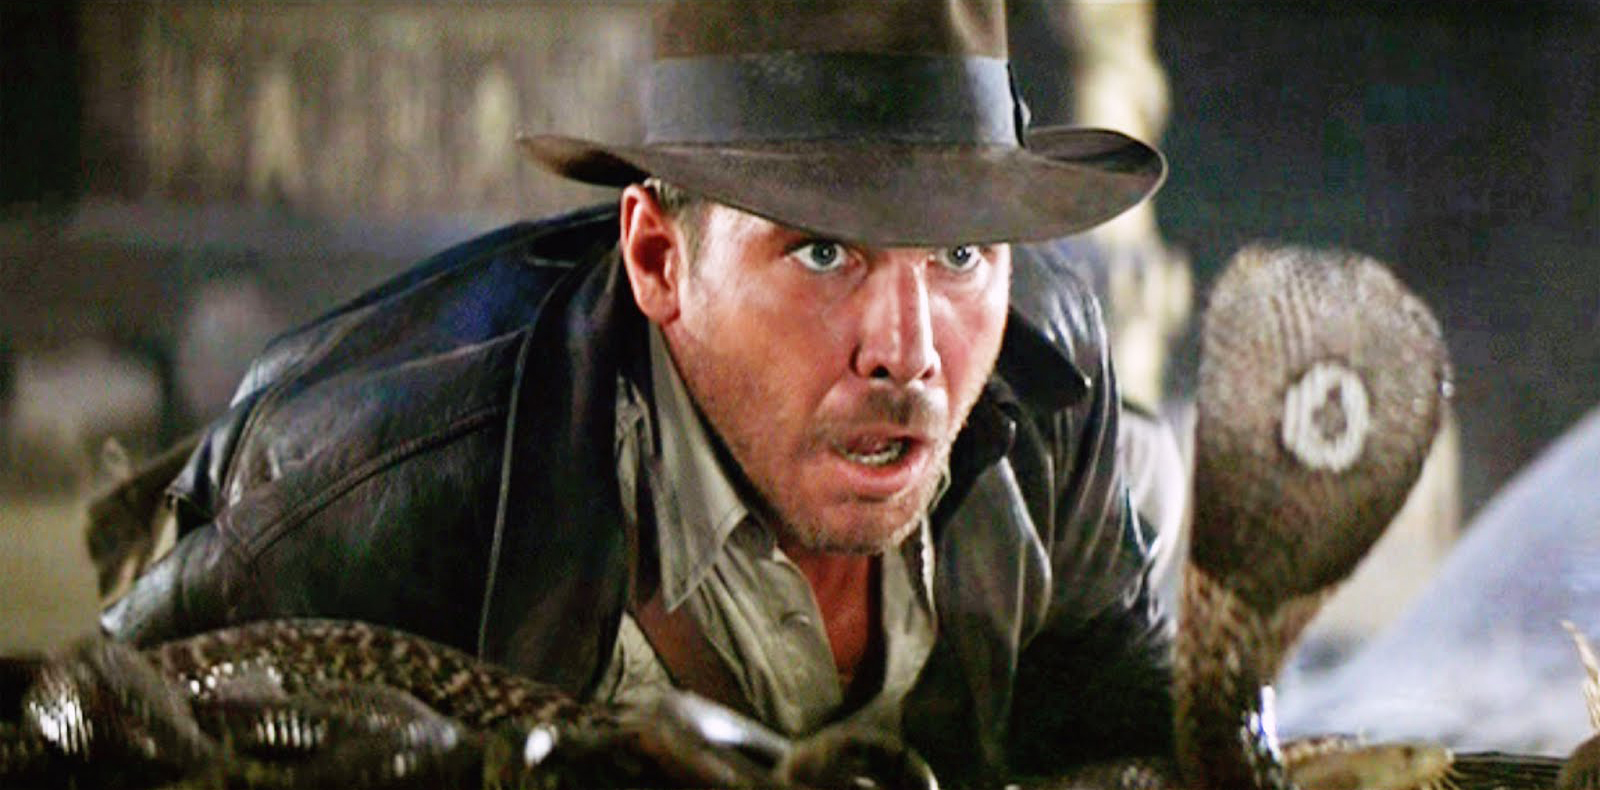 Indiana Jones Backgrounds, Compatible - PC, Mobile, Gadgets  1600x790 px